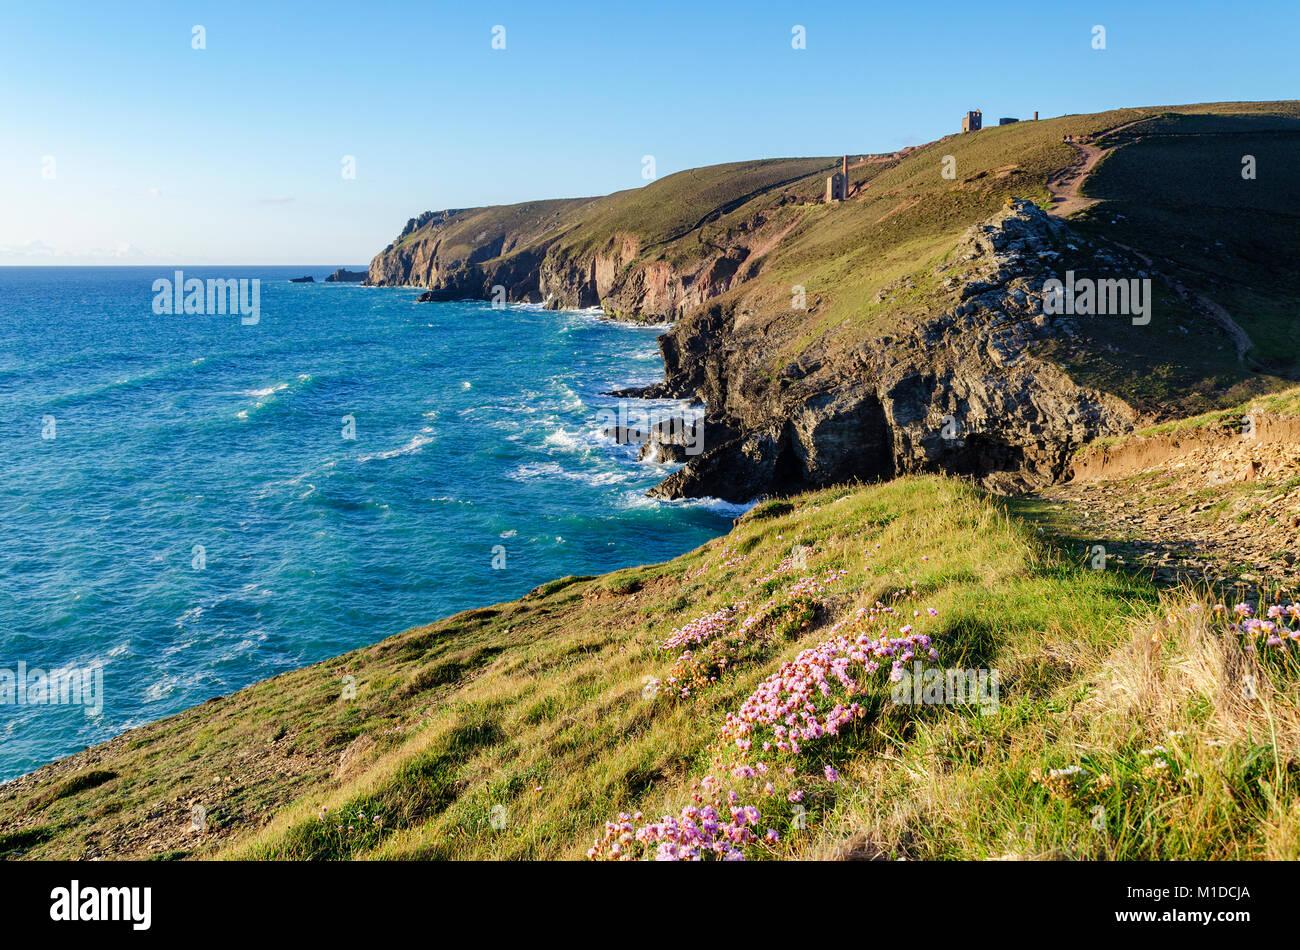 aonb the tin mining heritage coastline near st.agnes in cornwall, england, britain, uk. - Stock Image